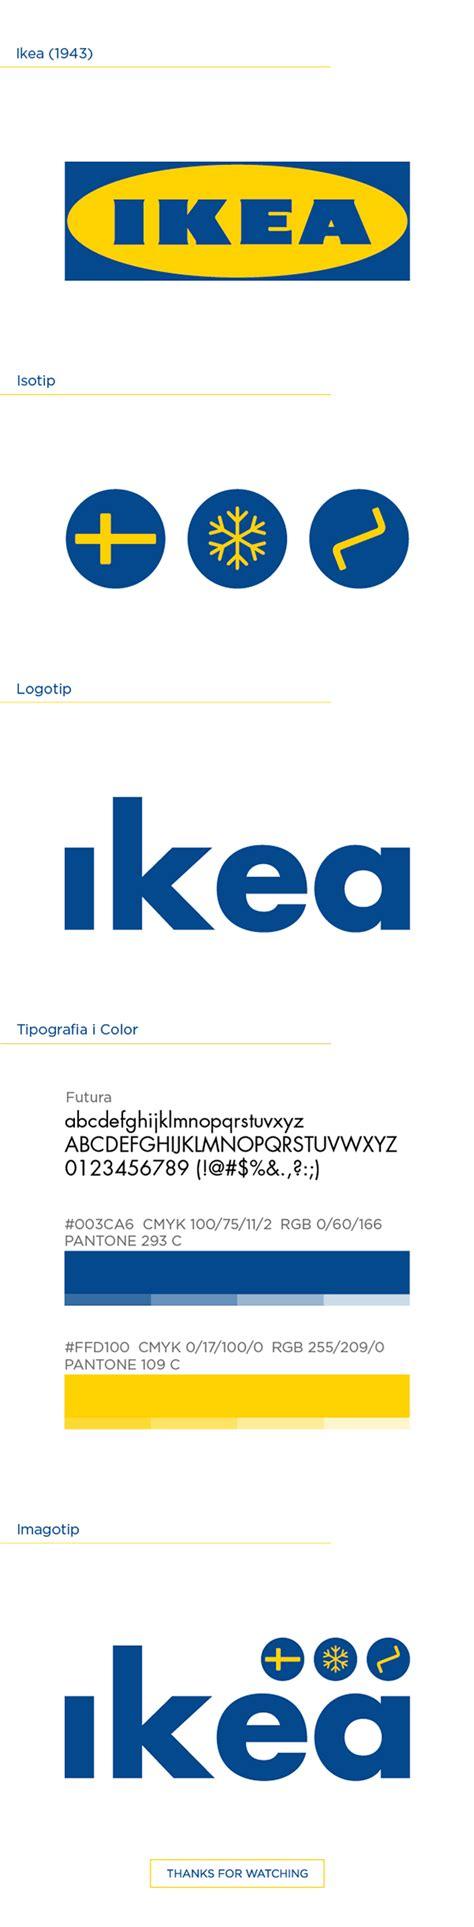 ikea logo redesign on behance ikea rebrand on behance